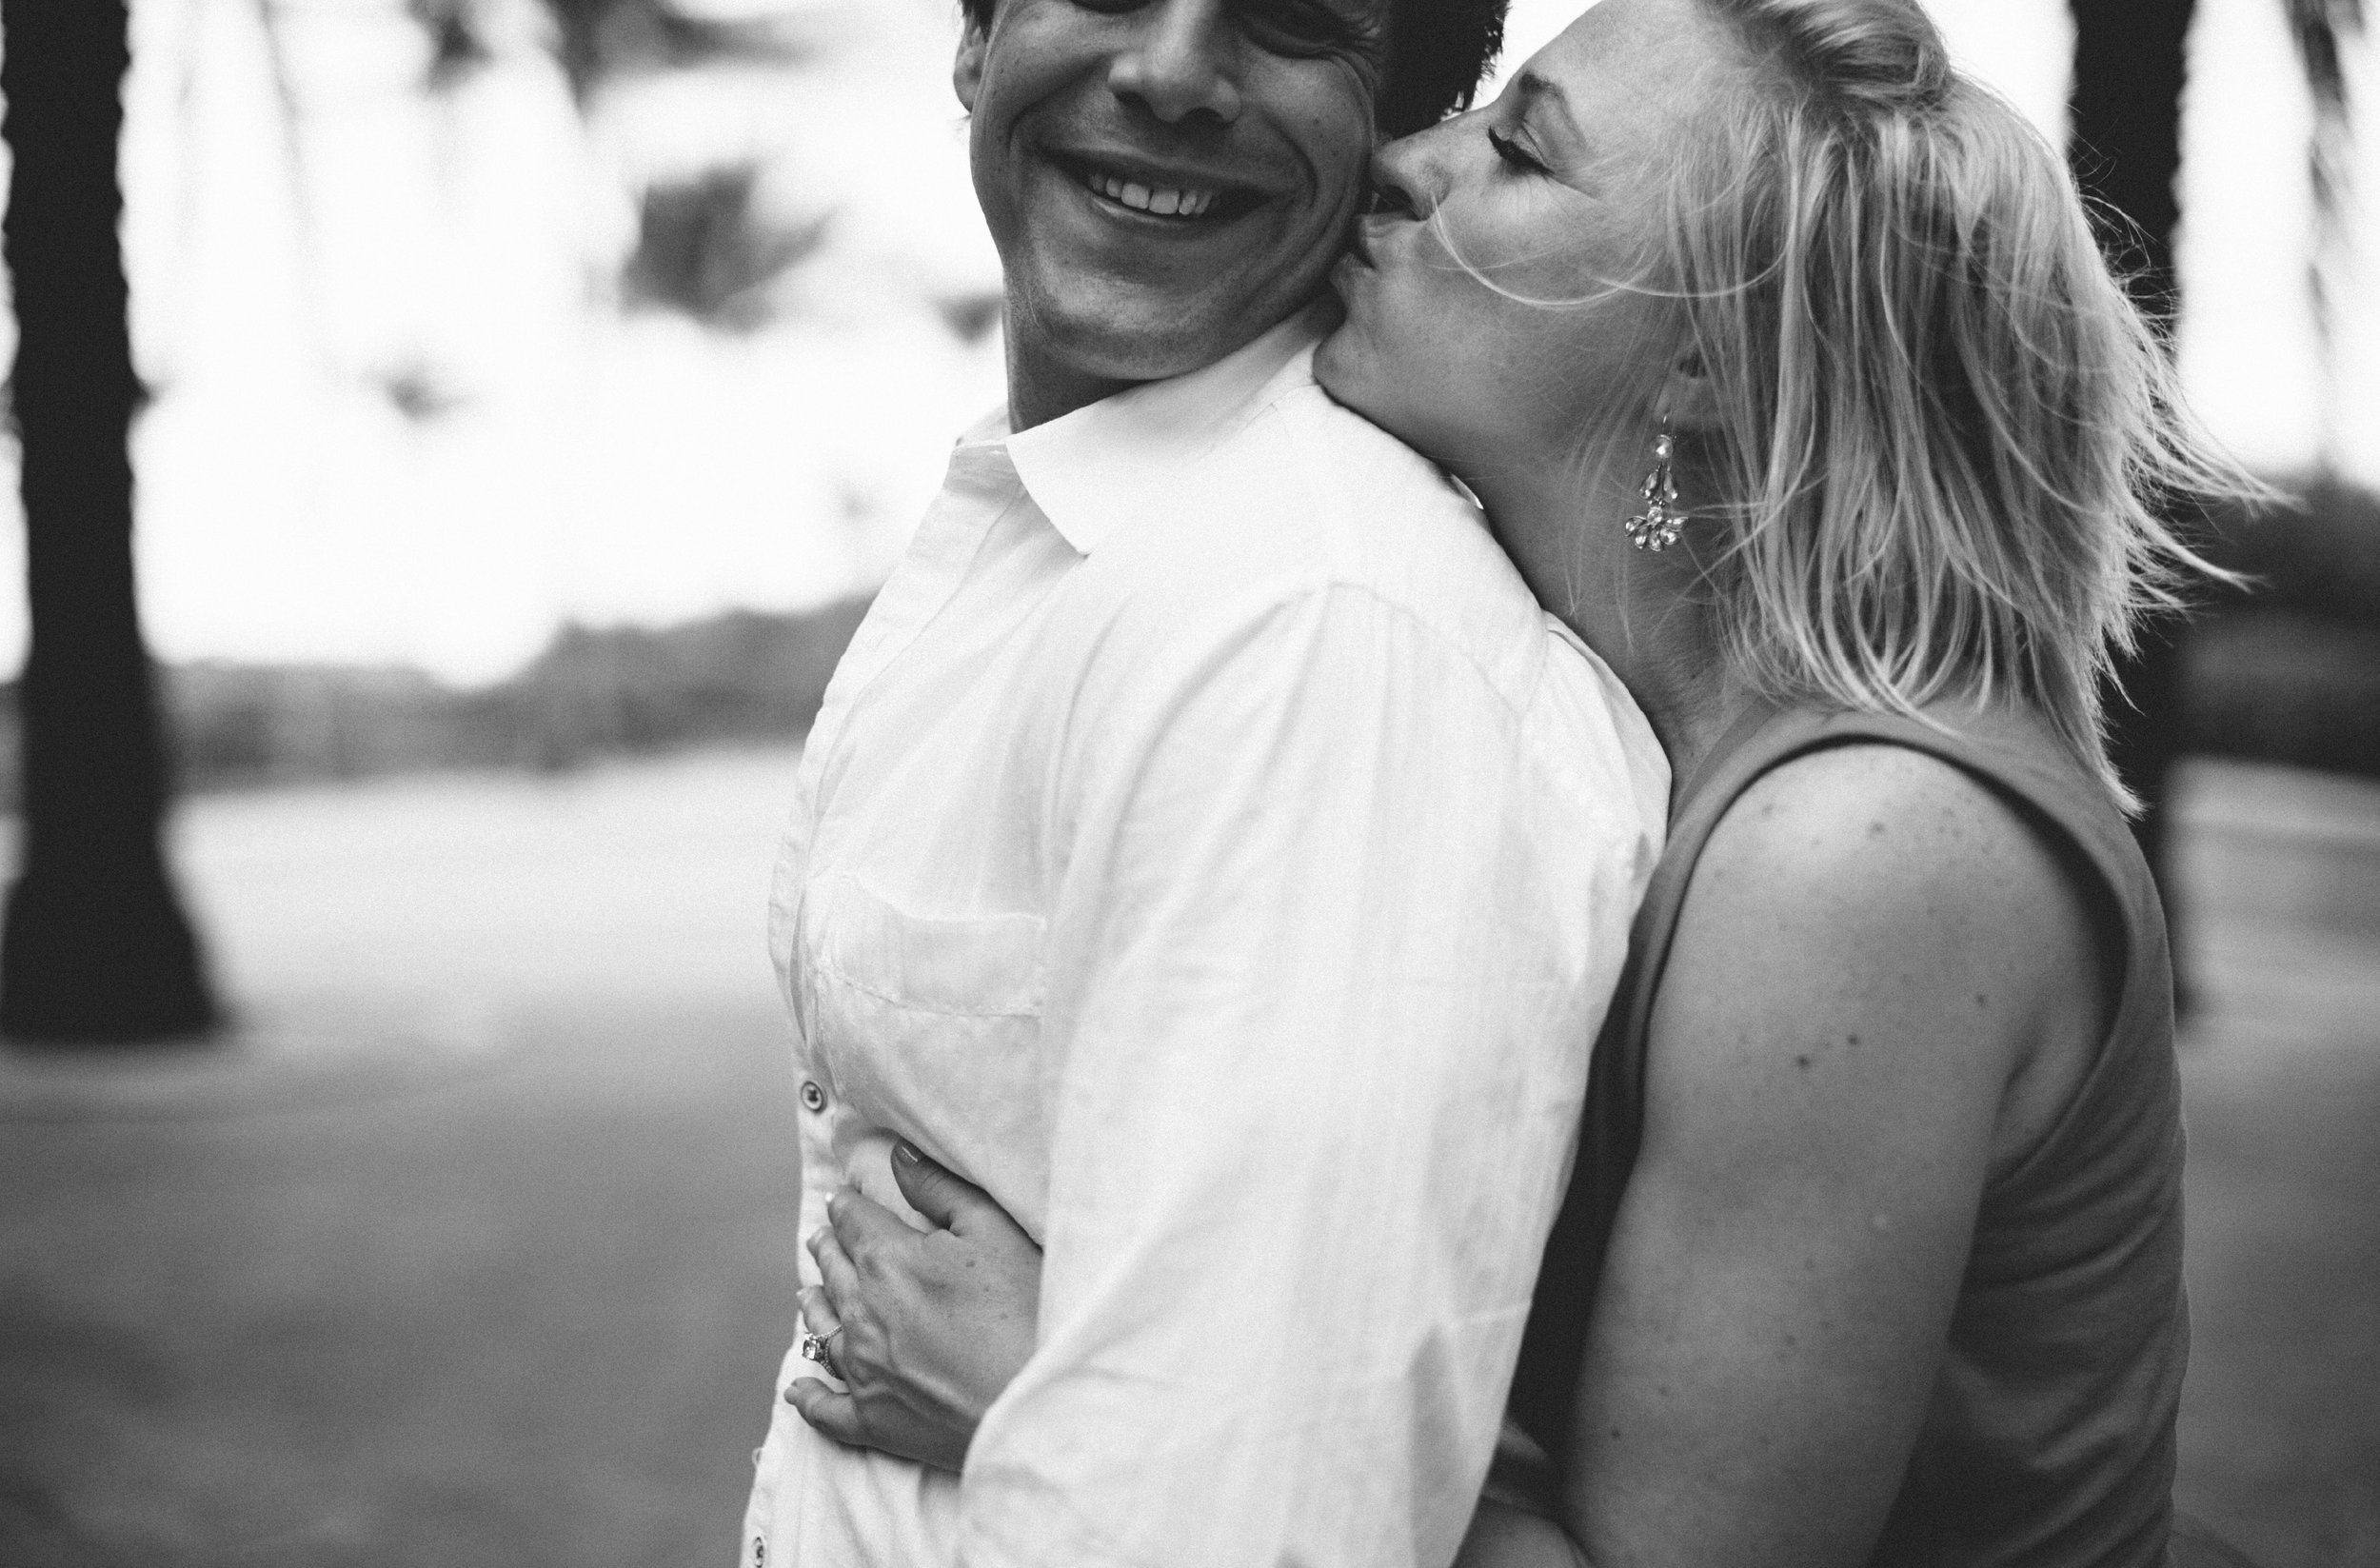 Jackie + Joe South Beach Engagement Shoot21.jpg